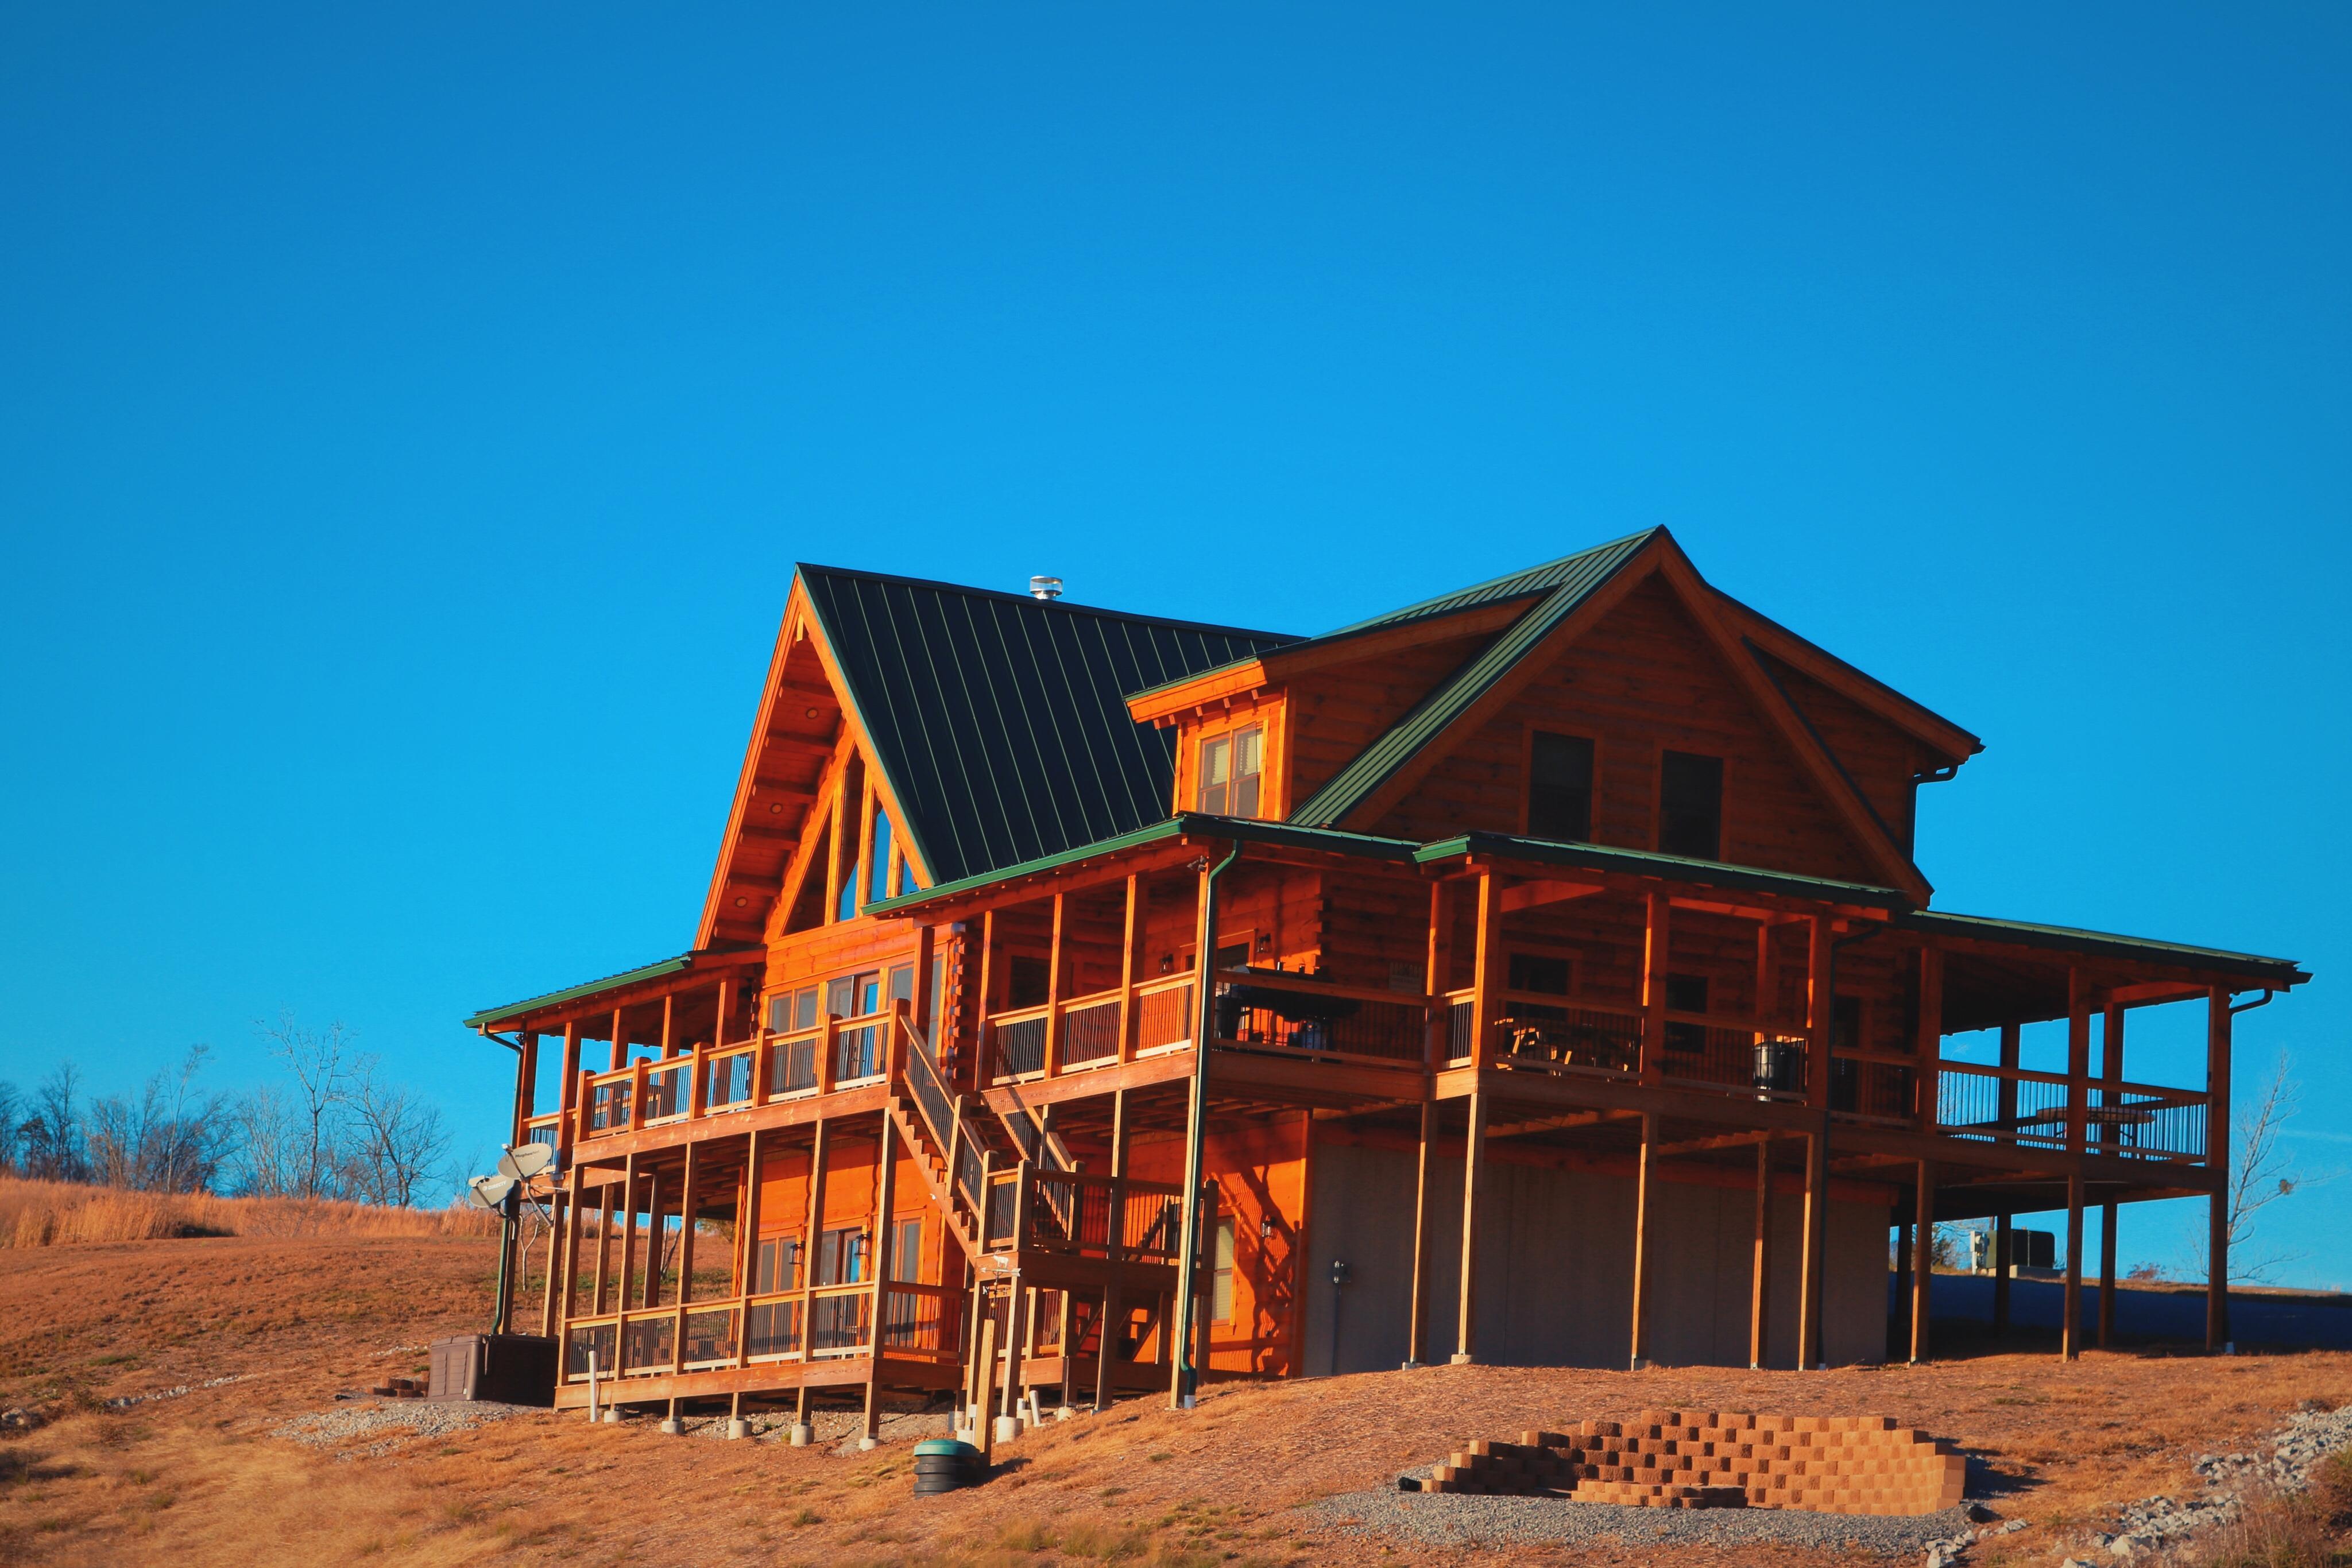 Norris Lake Cabin Rentals image 0